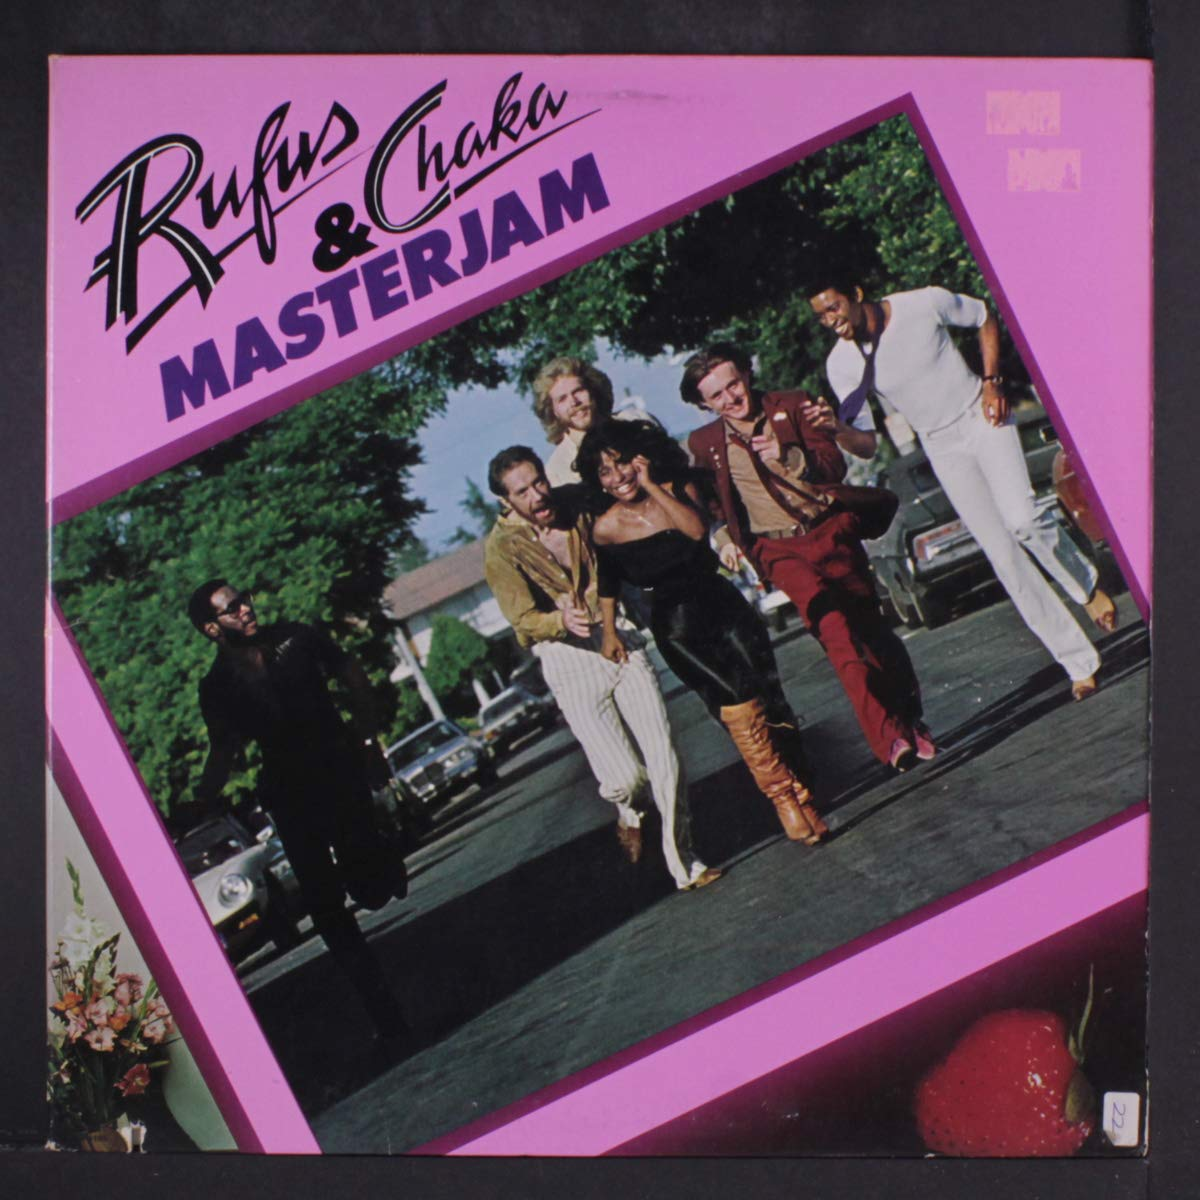 Rufus Masterjam